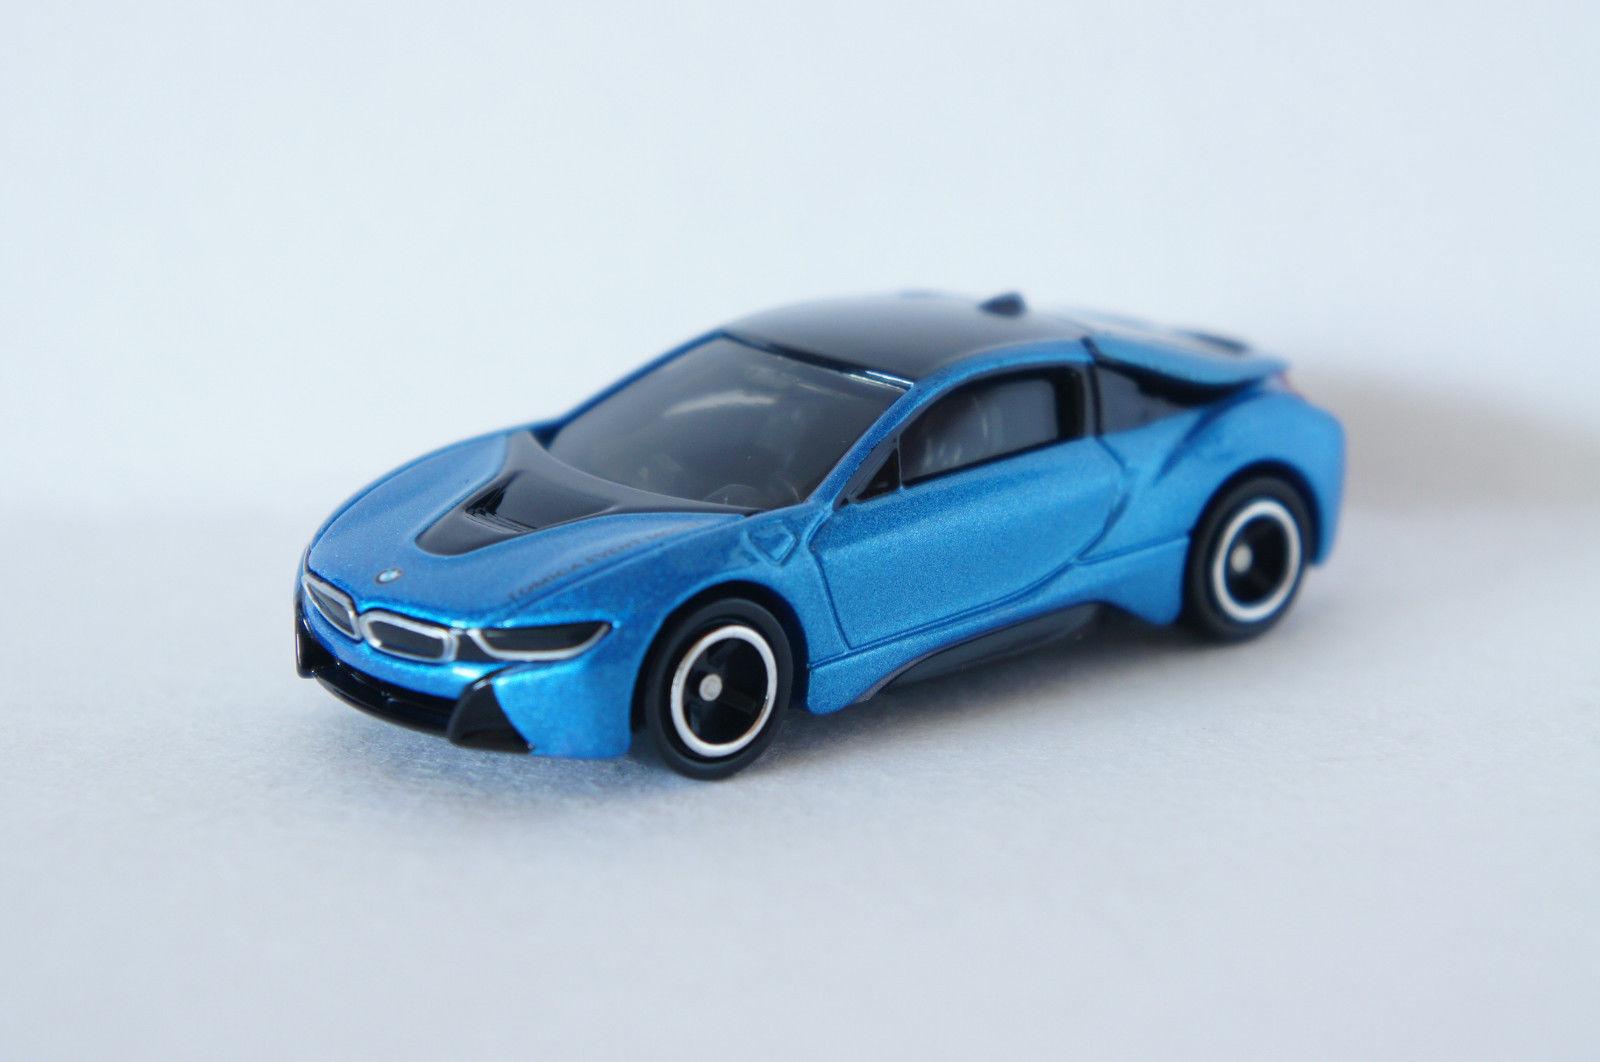 Awesome TOMICA EVENT MODEL No14 BMW I8 1 61 2017 2018